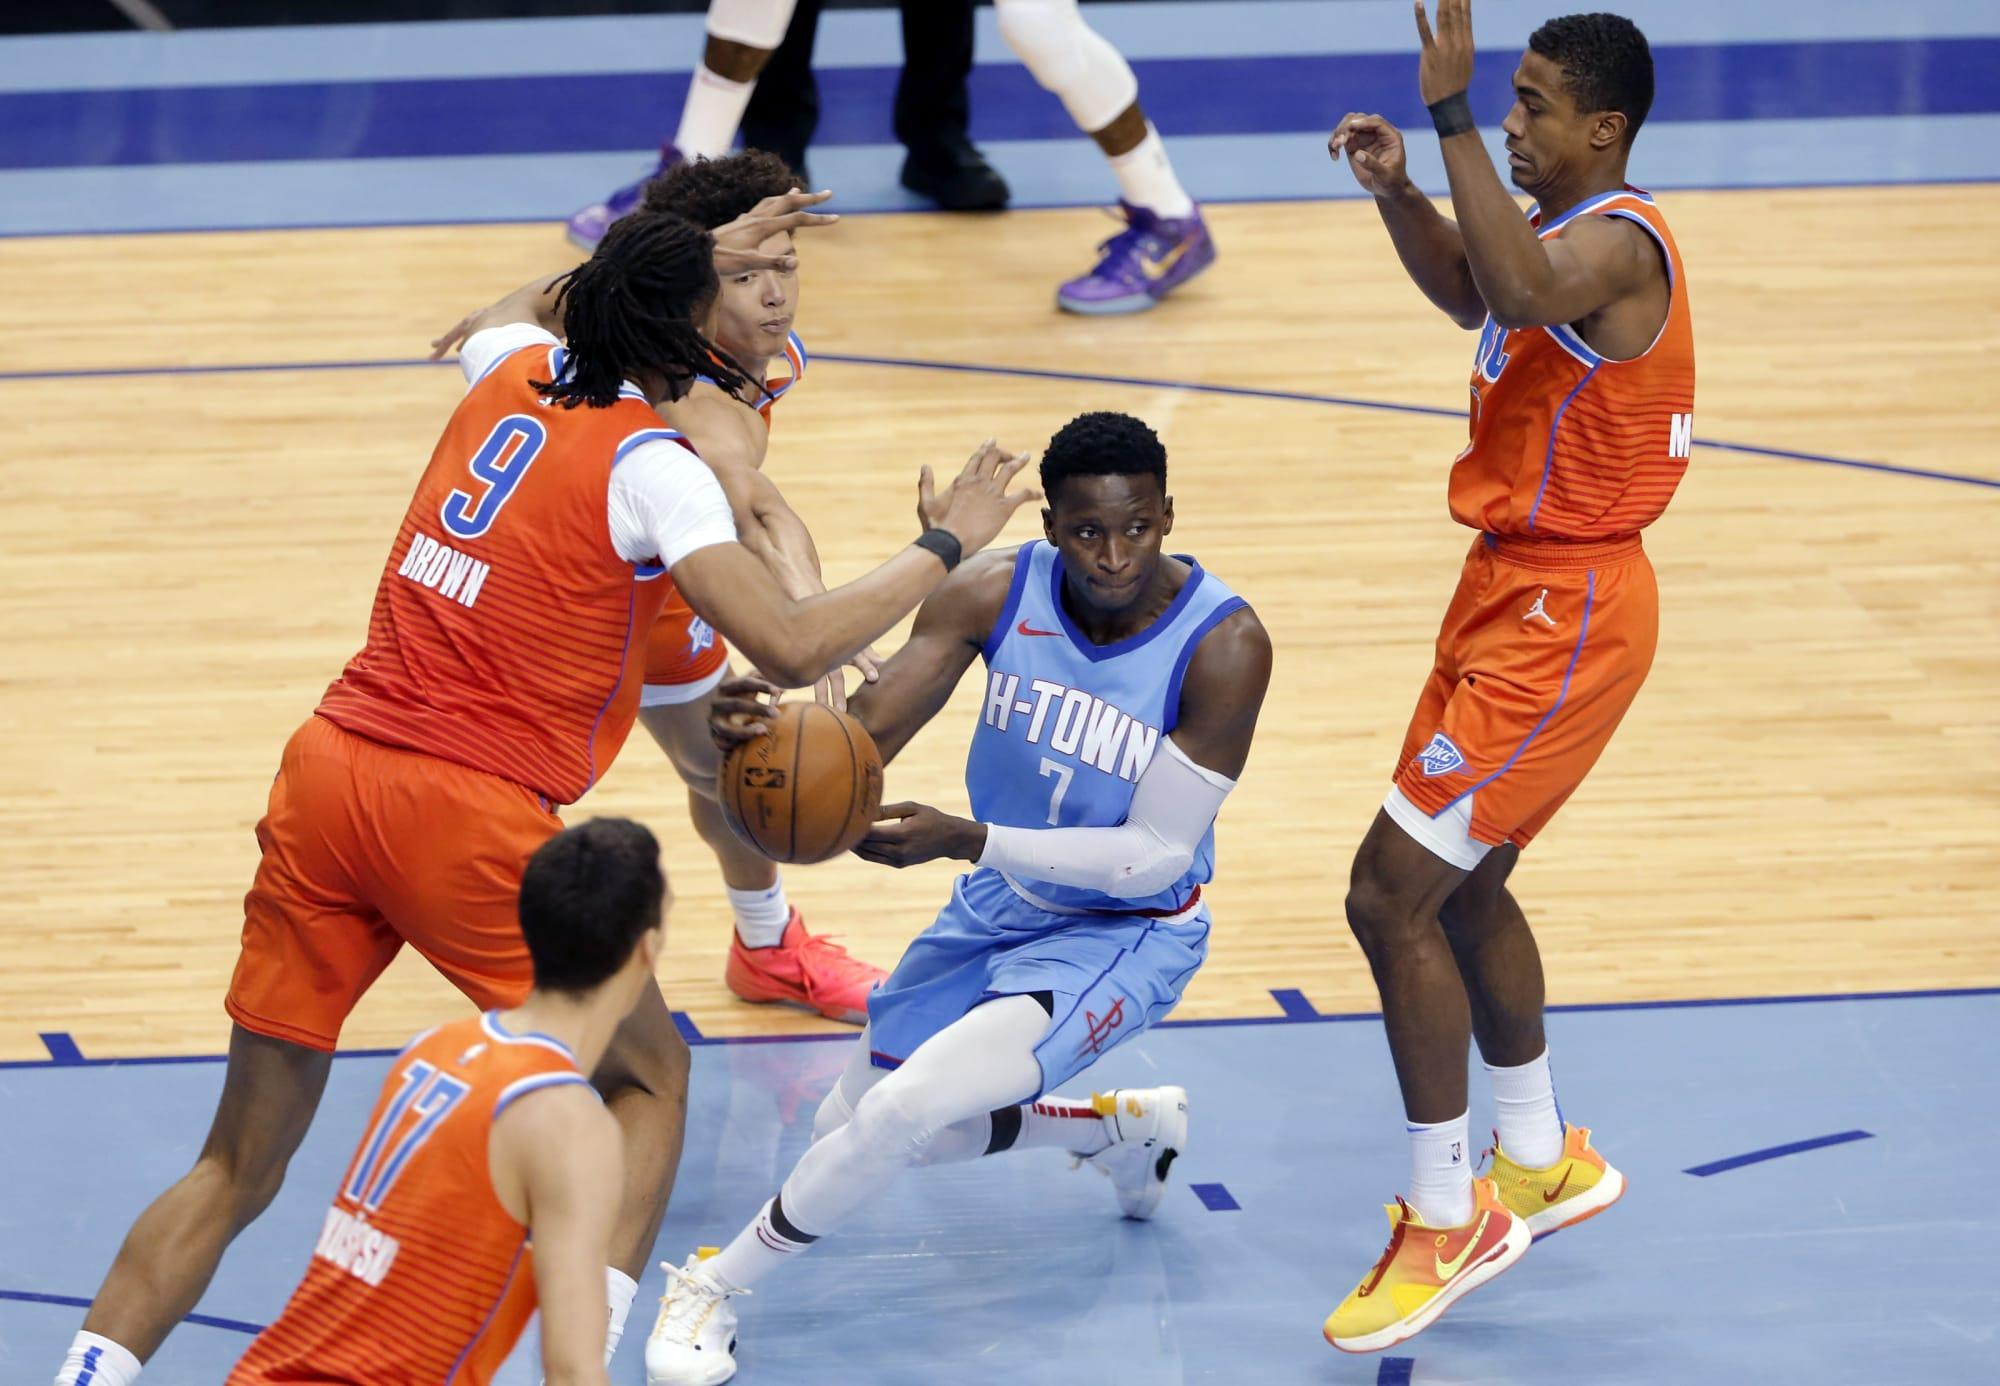 OKC Thunder: ESPN pegs Maledon and Pokusevski as rookies with future potential